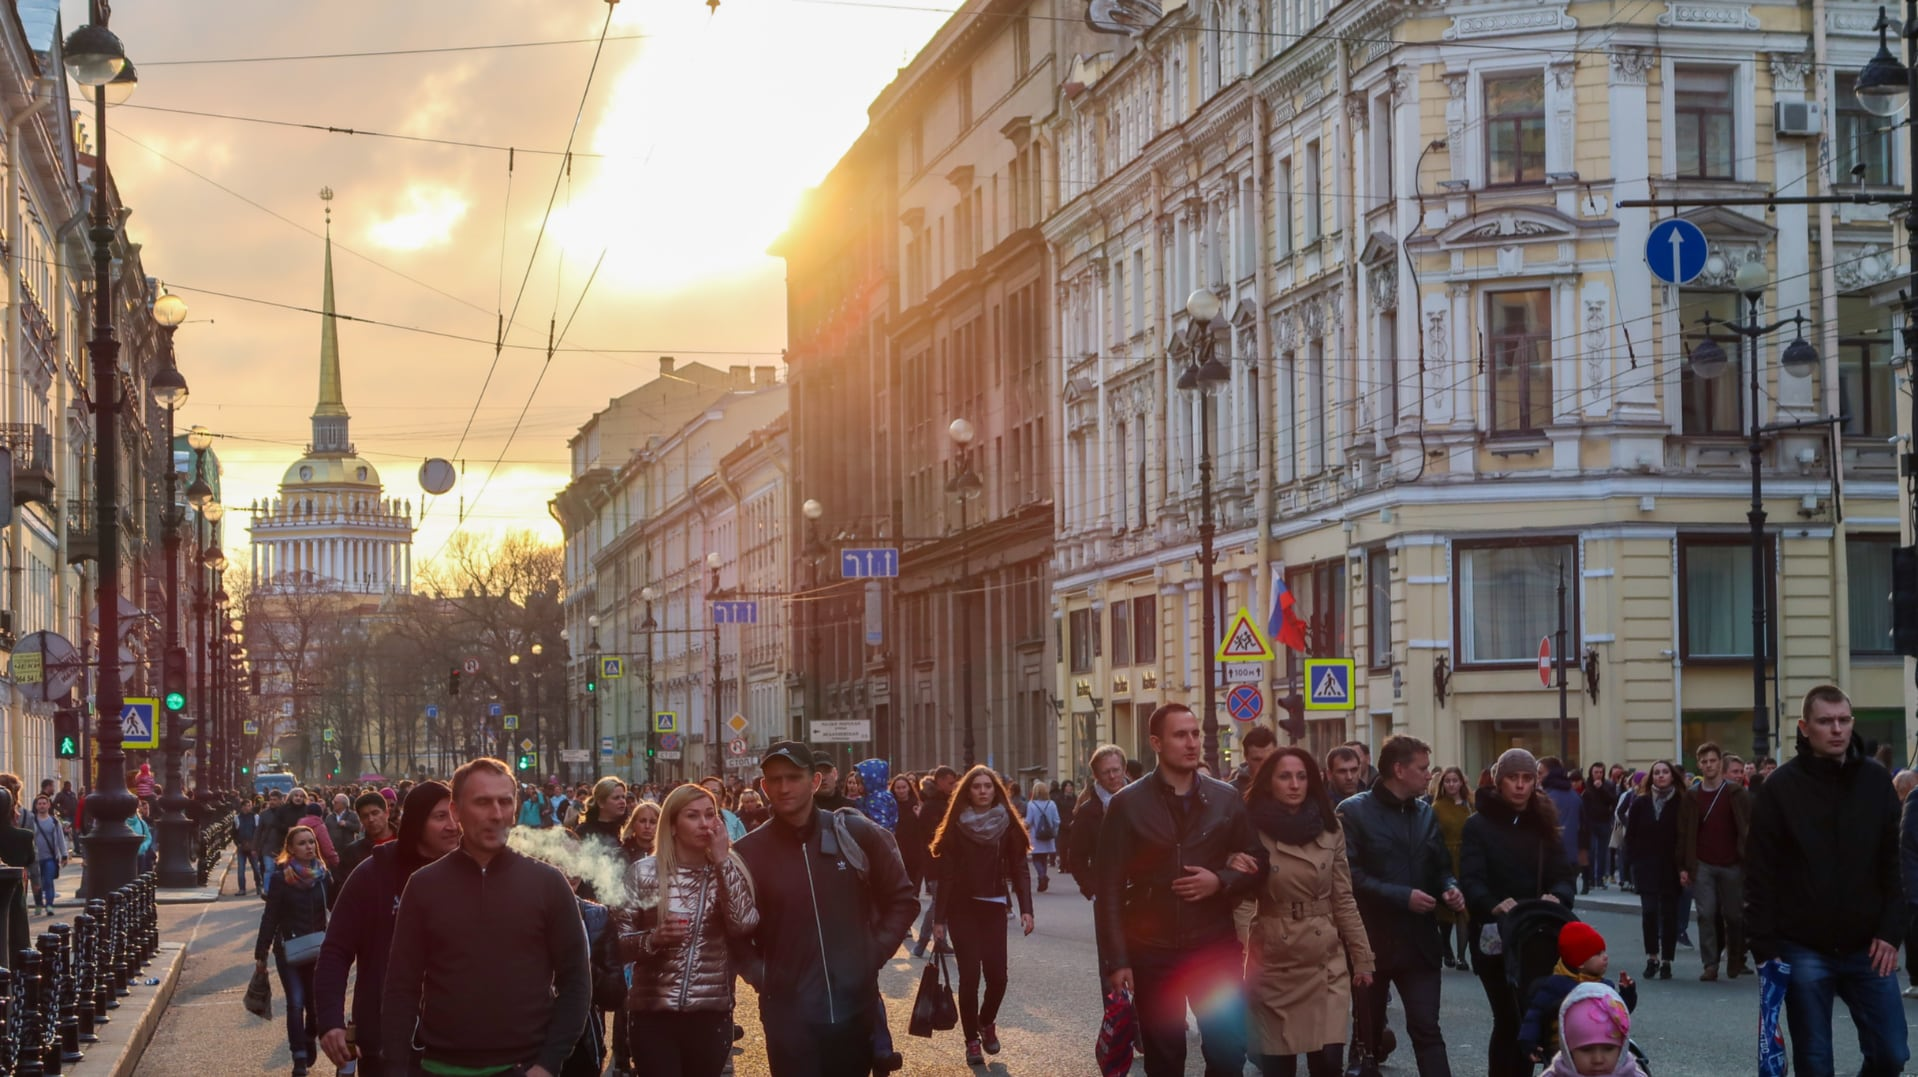 Sway the way st petersburg nevsky prospiekt